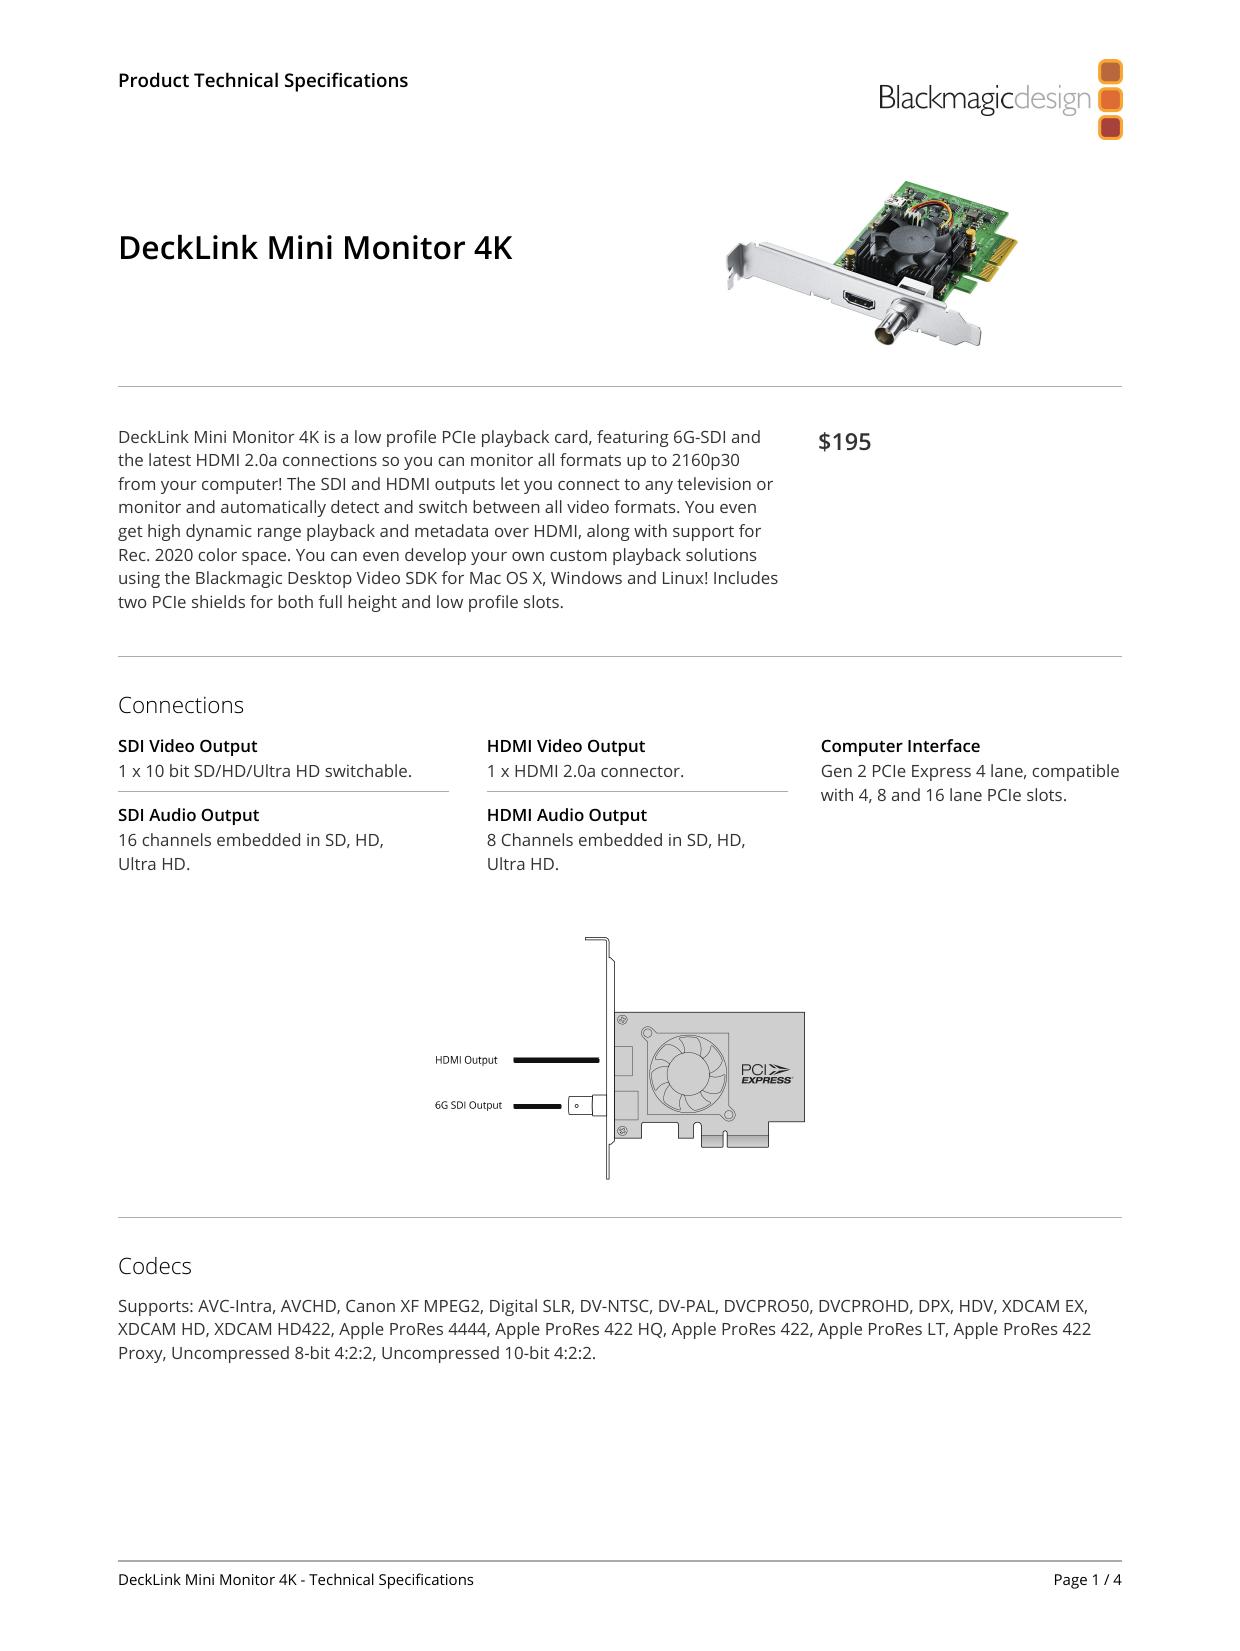 Blackmagic Design Decklink Tech Specs Manualzz